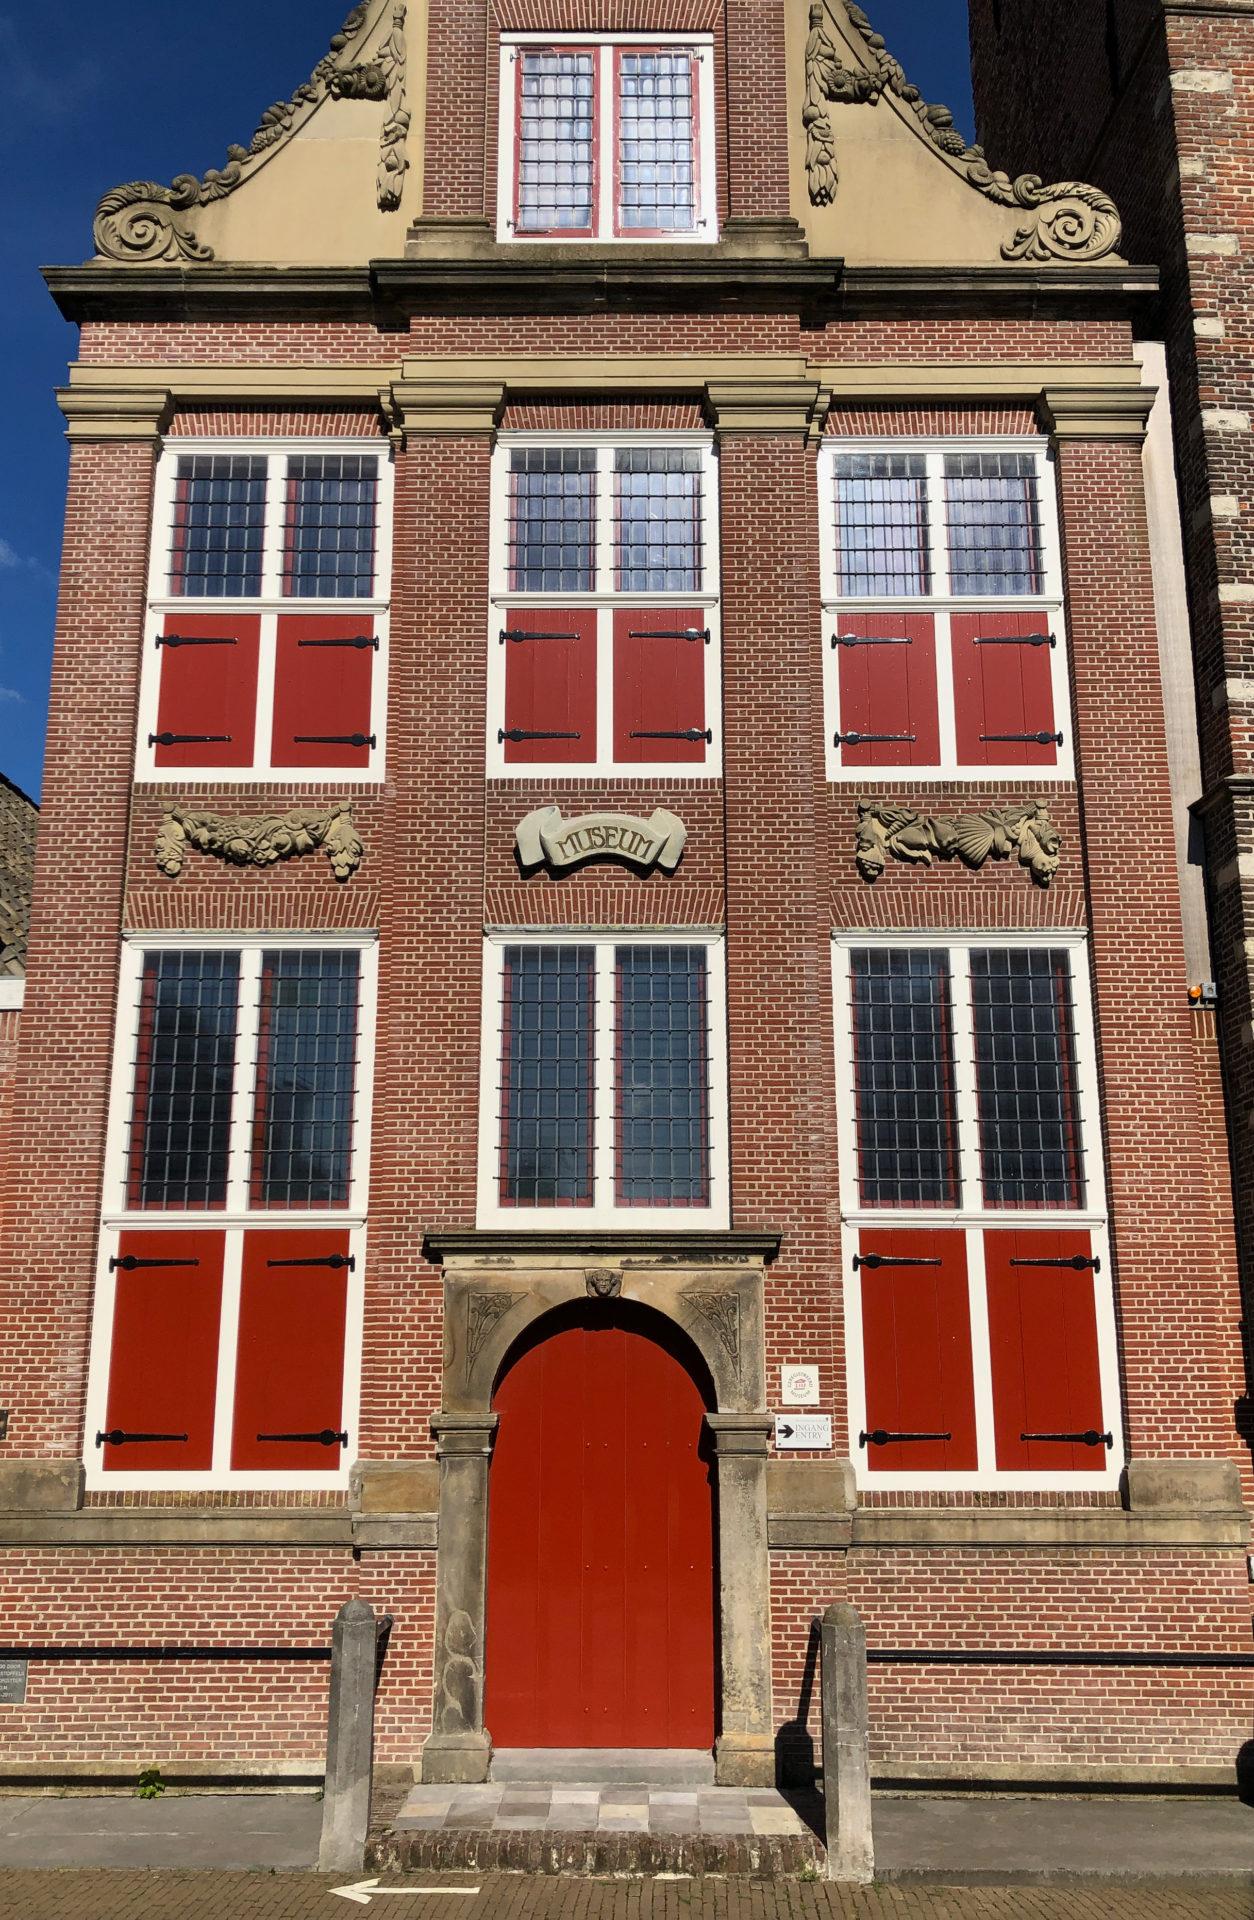 Giebelhaus als Museum in Monnickendam in Holland